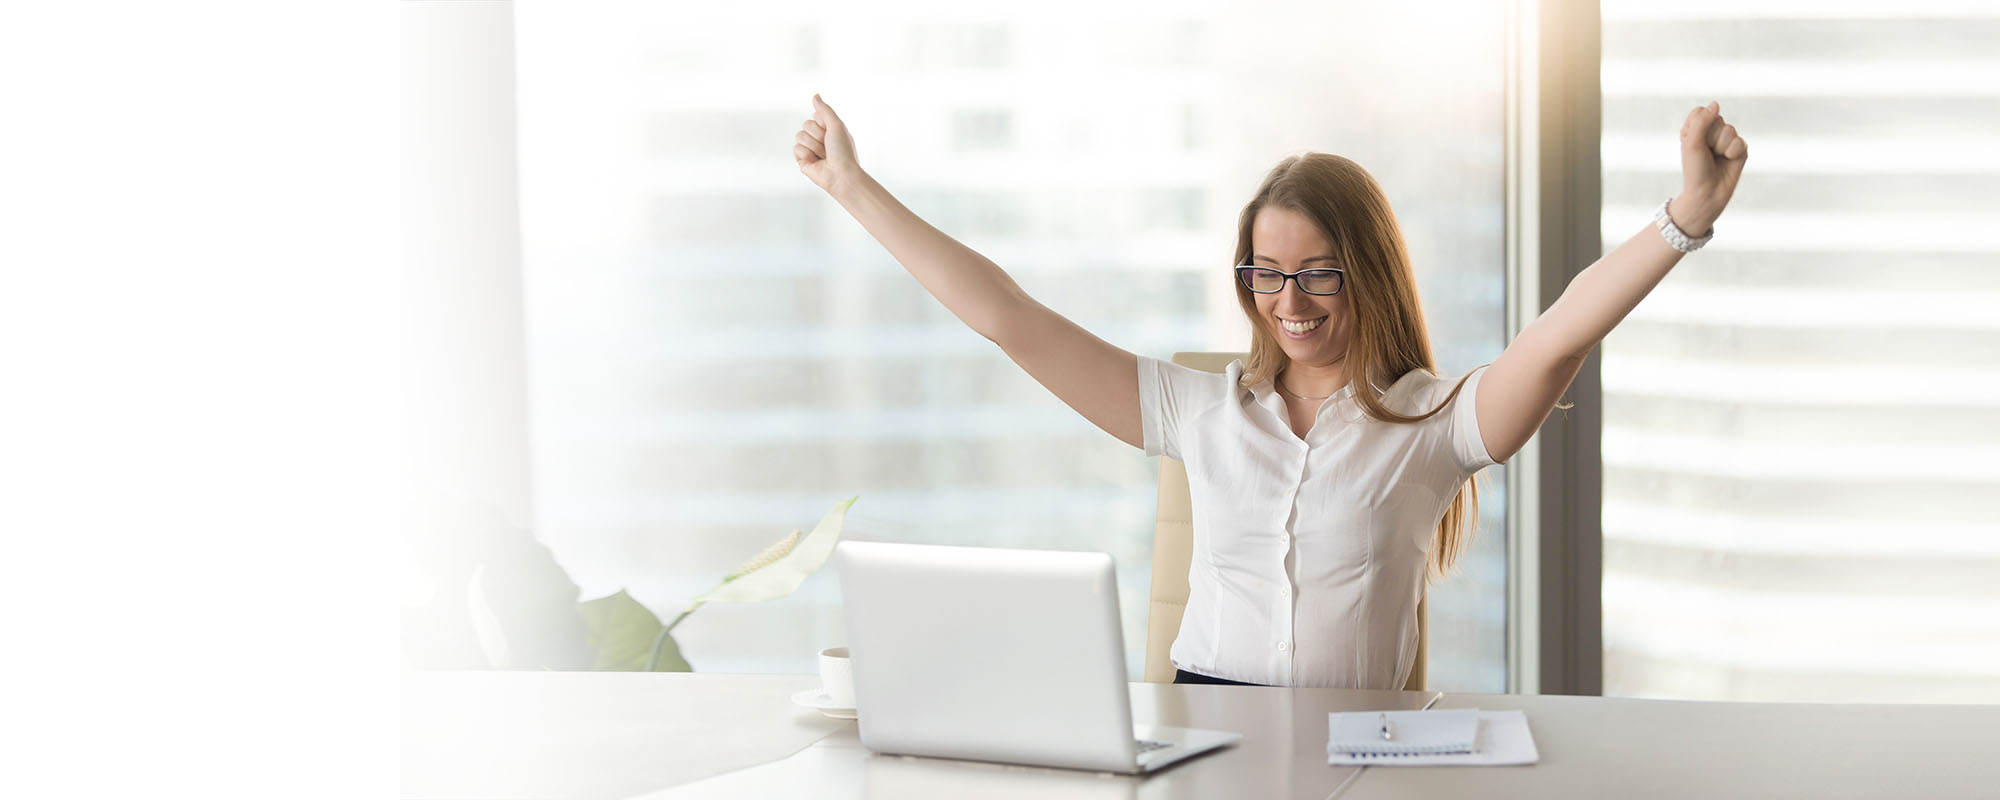 Easy Builder website creation